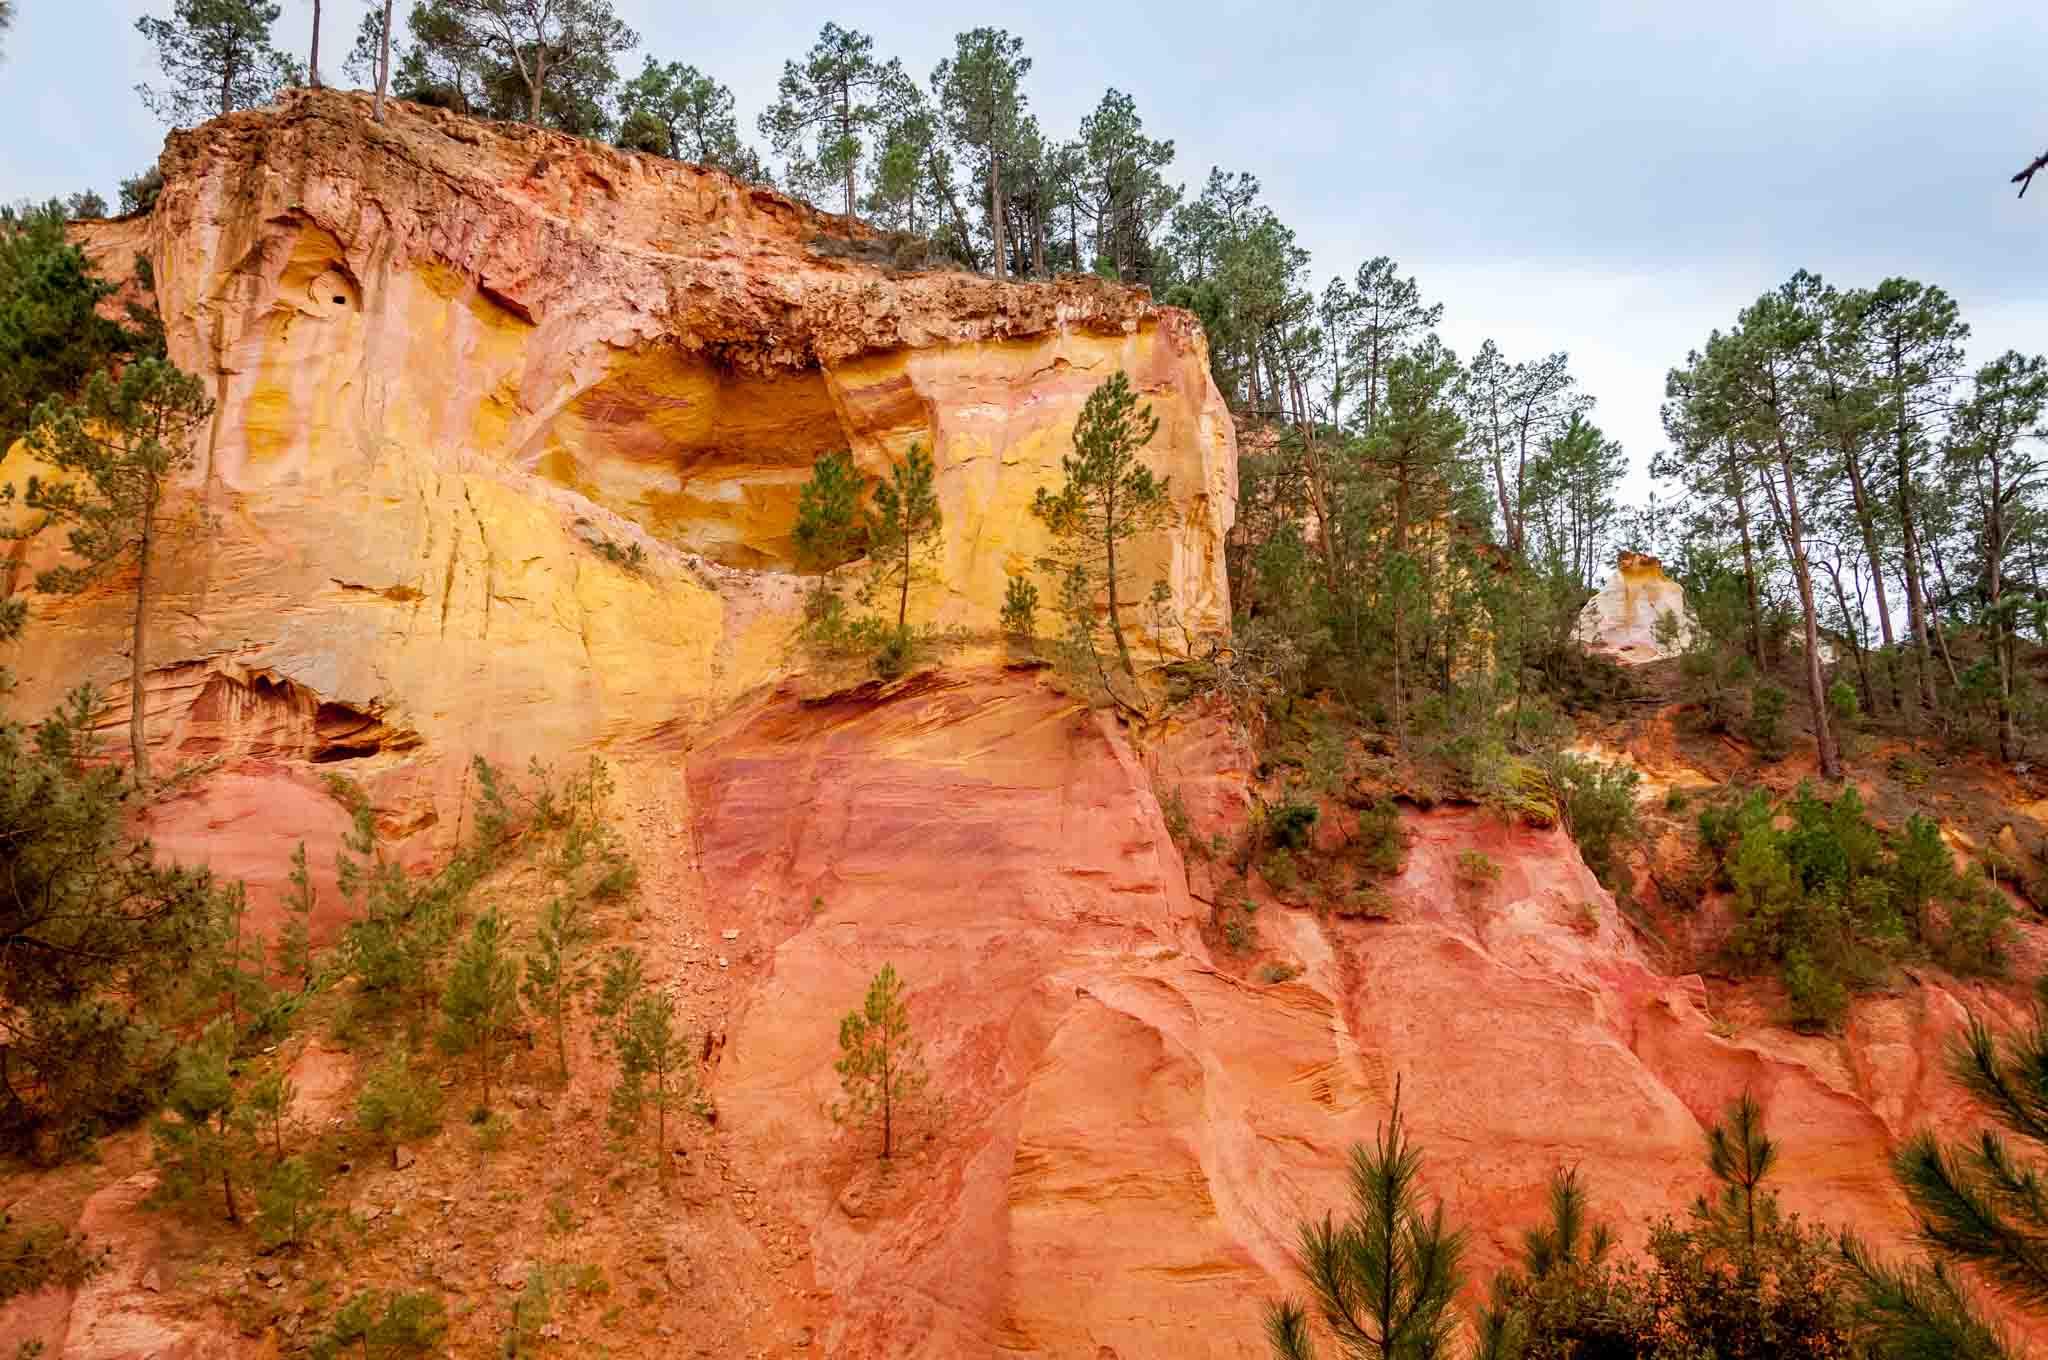 Yellow and orange ochre deposits in cliffs